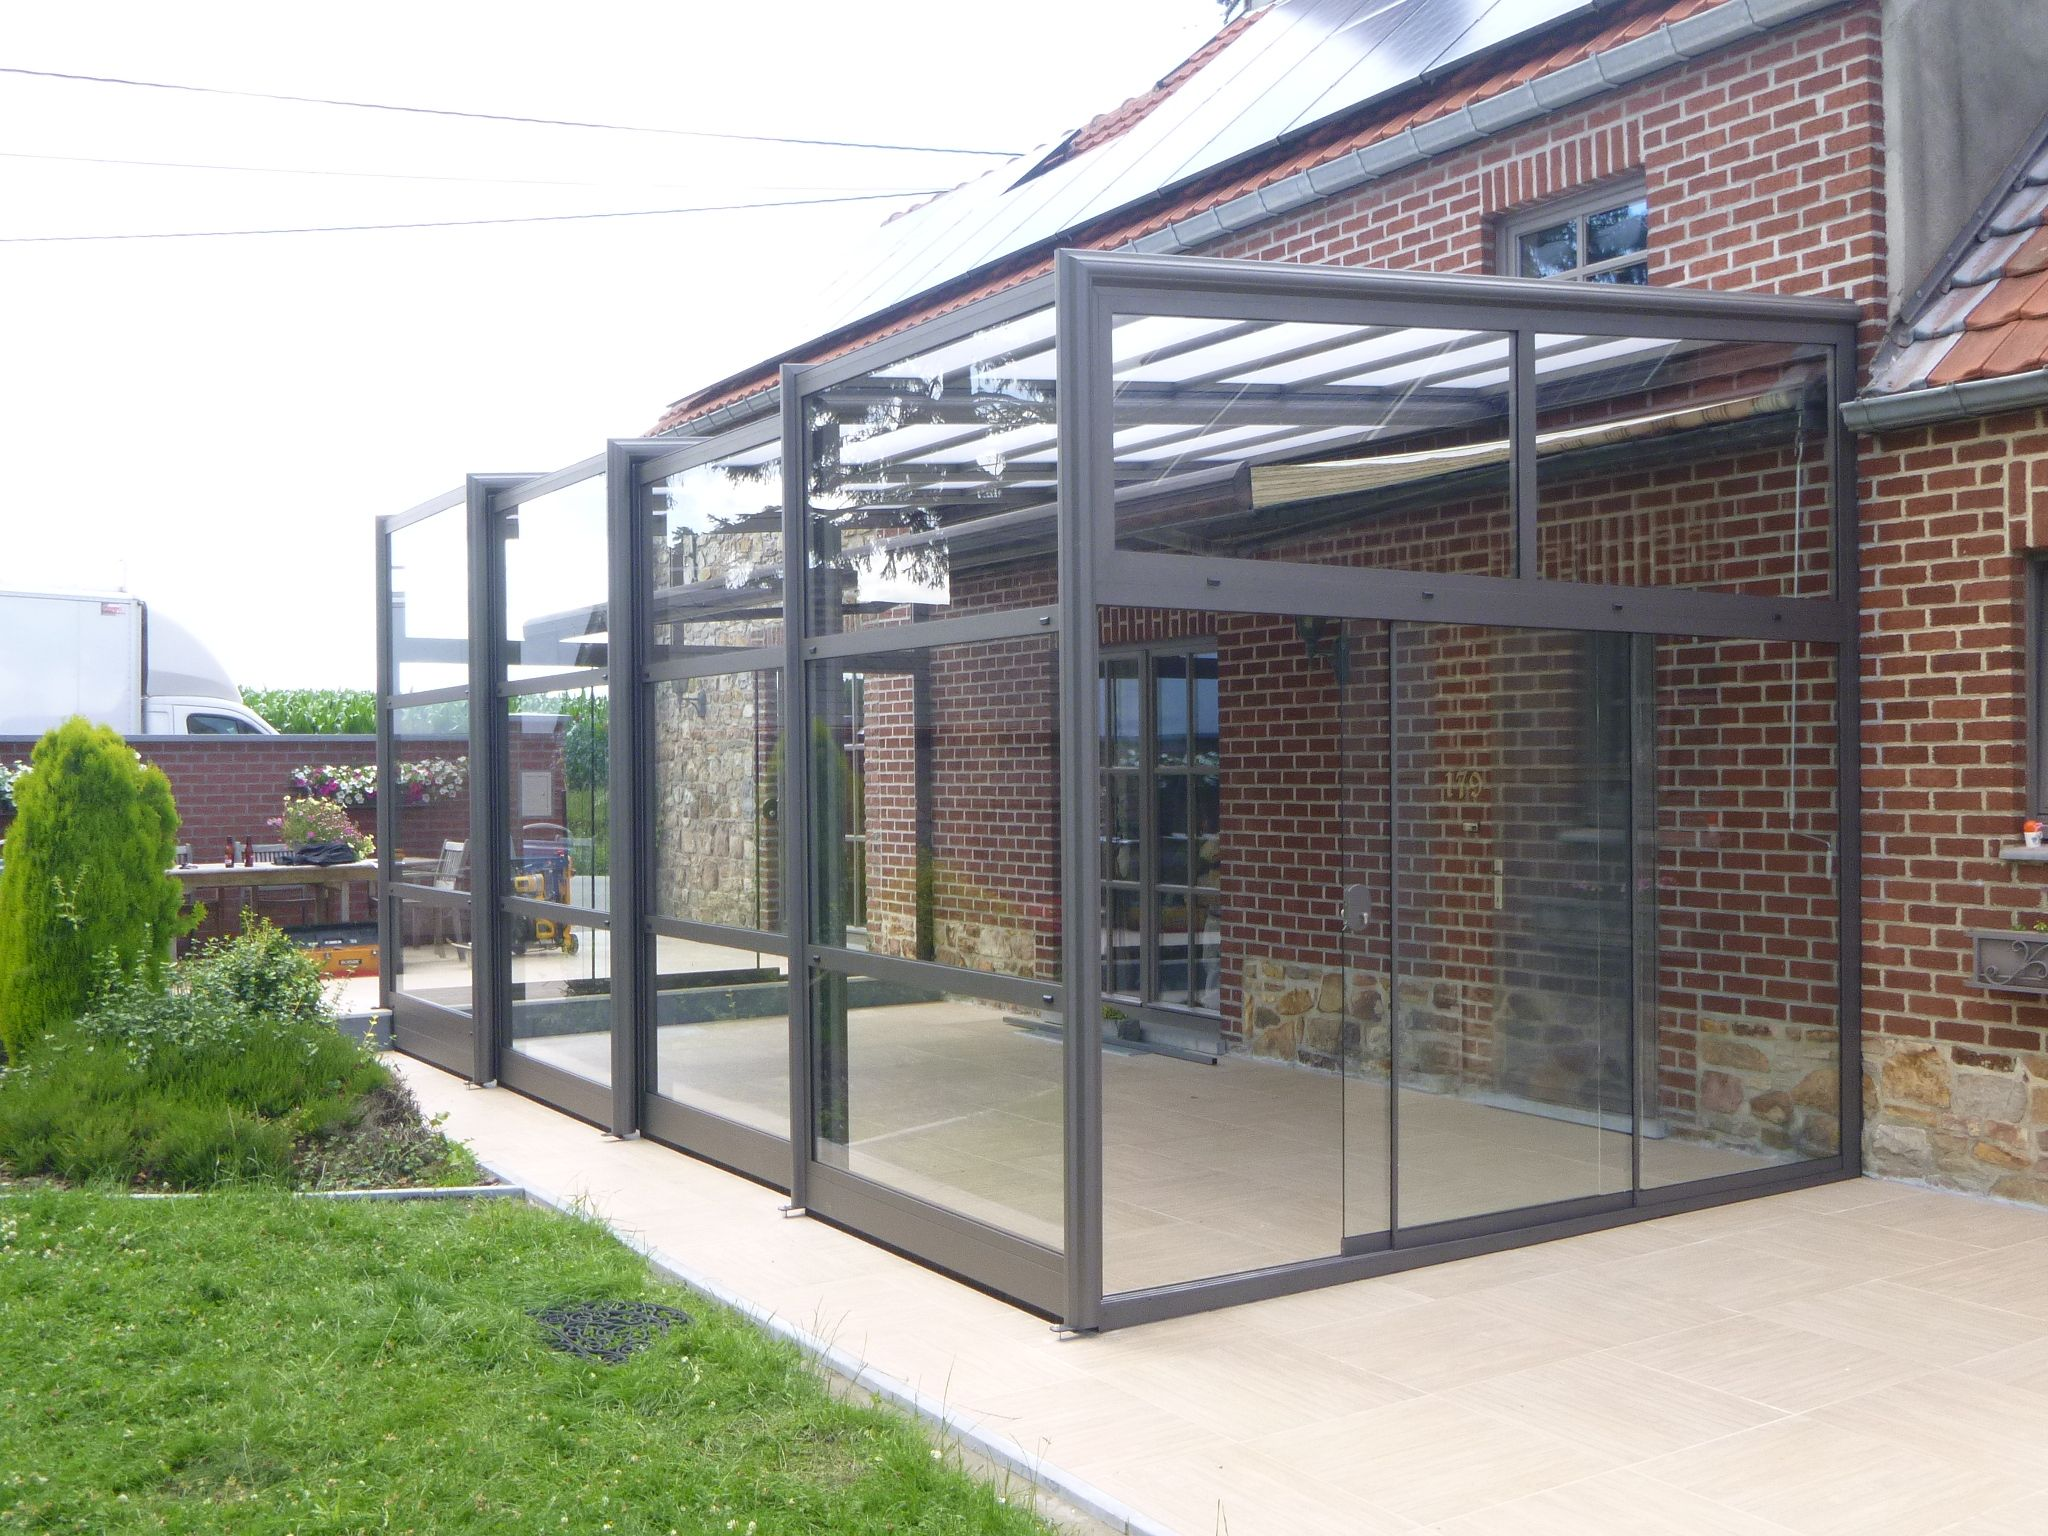 Les Abris De Terrasse Verandair Home Improvements In 2019